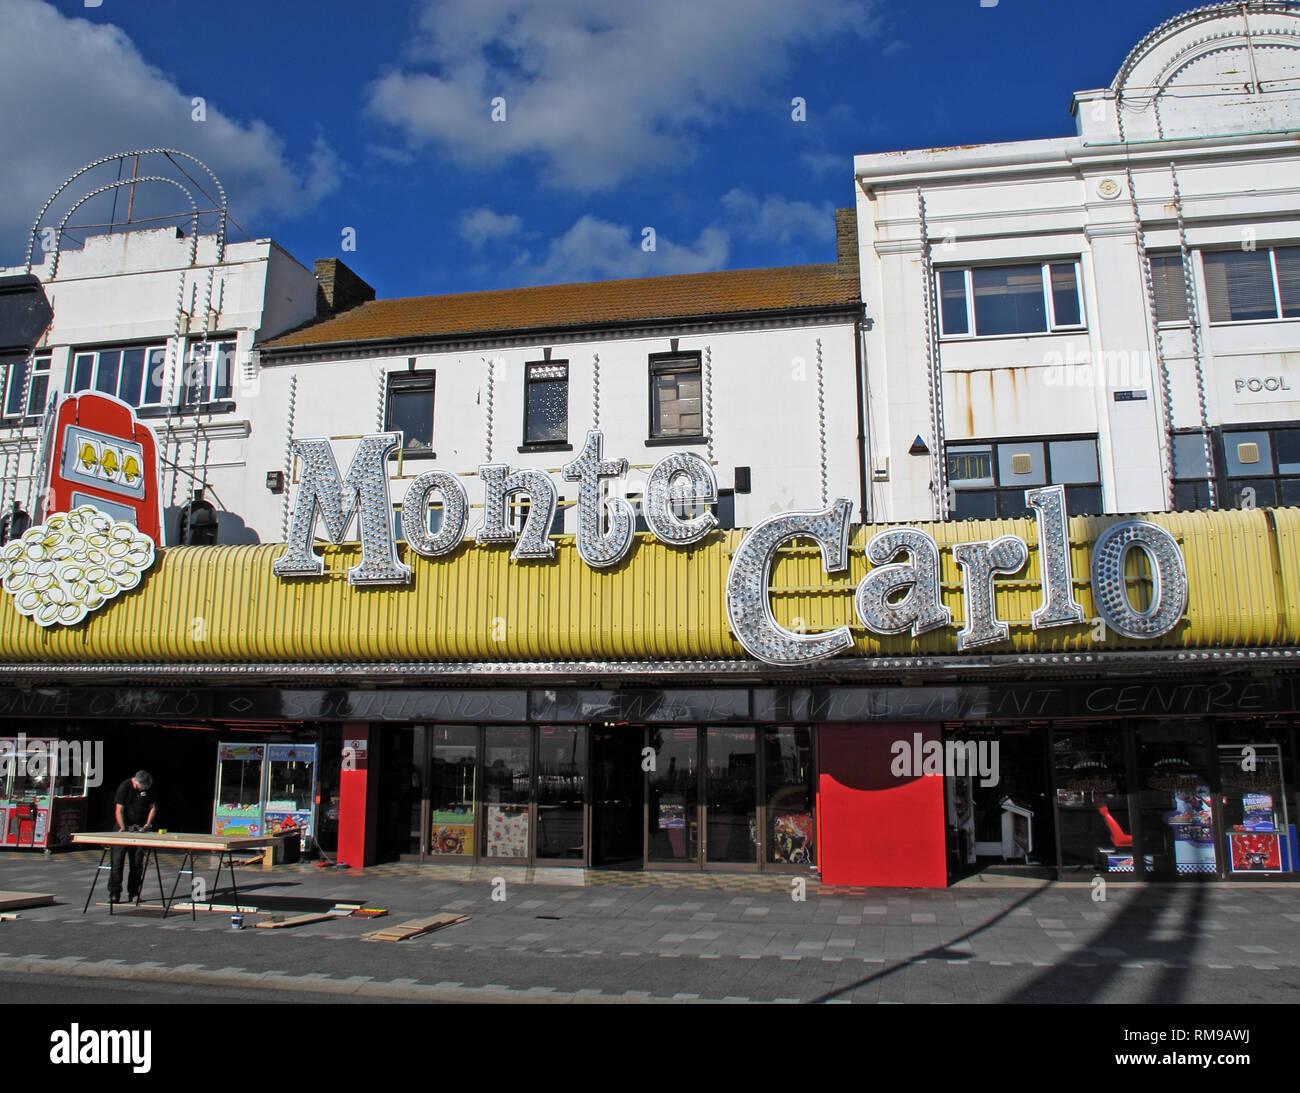 GoTonySmith,HotpixUK,@HotpixUK,England,UK,GB,Southend,Seaside,town,Essex,South